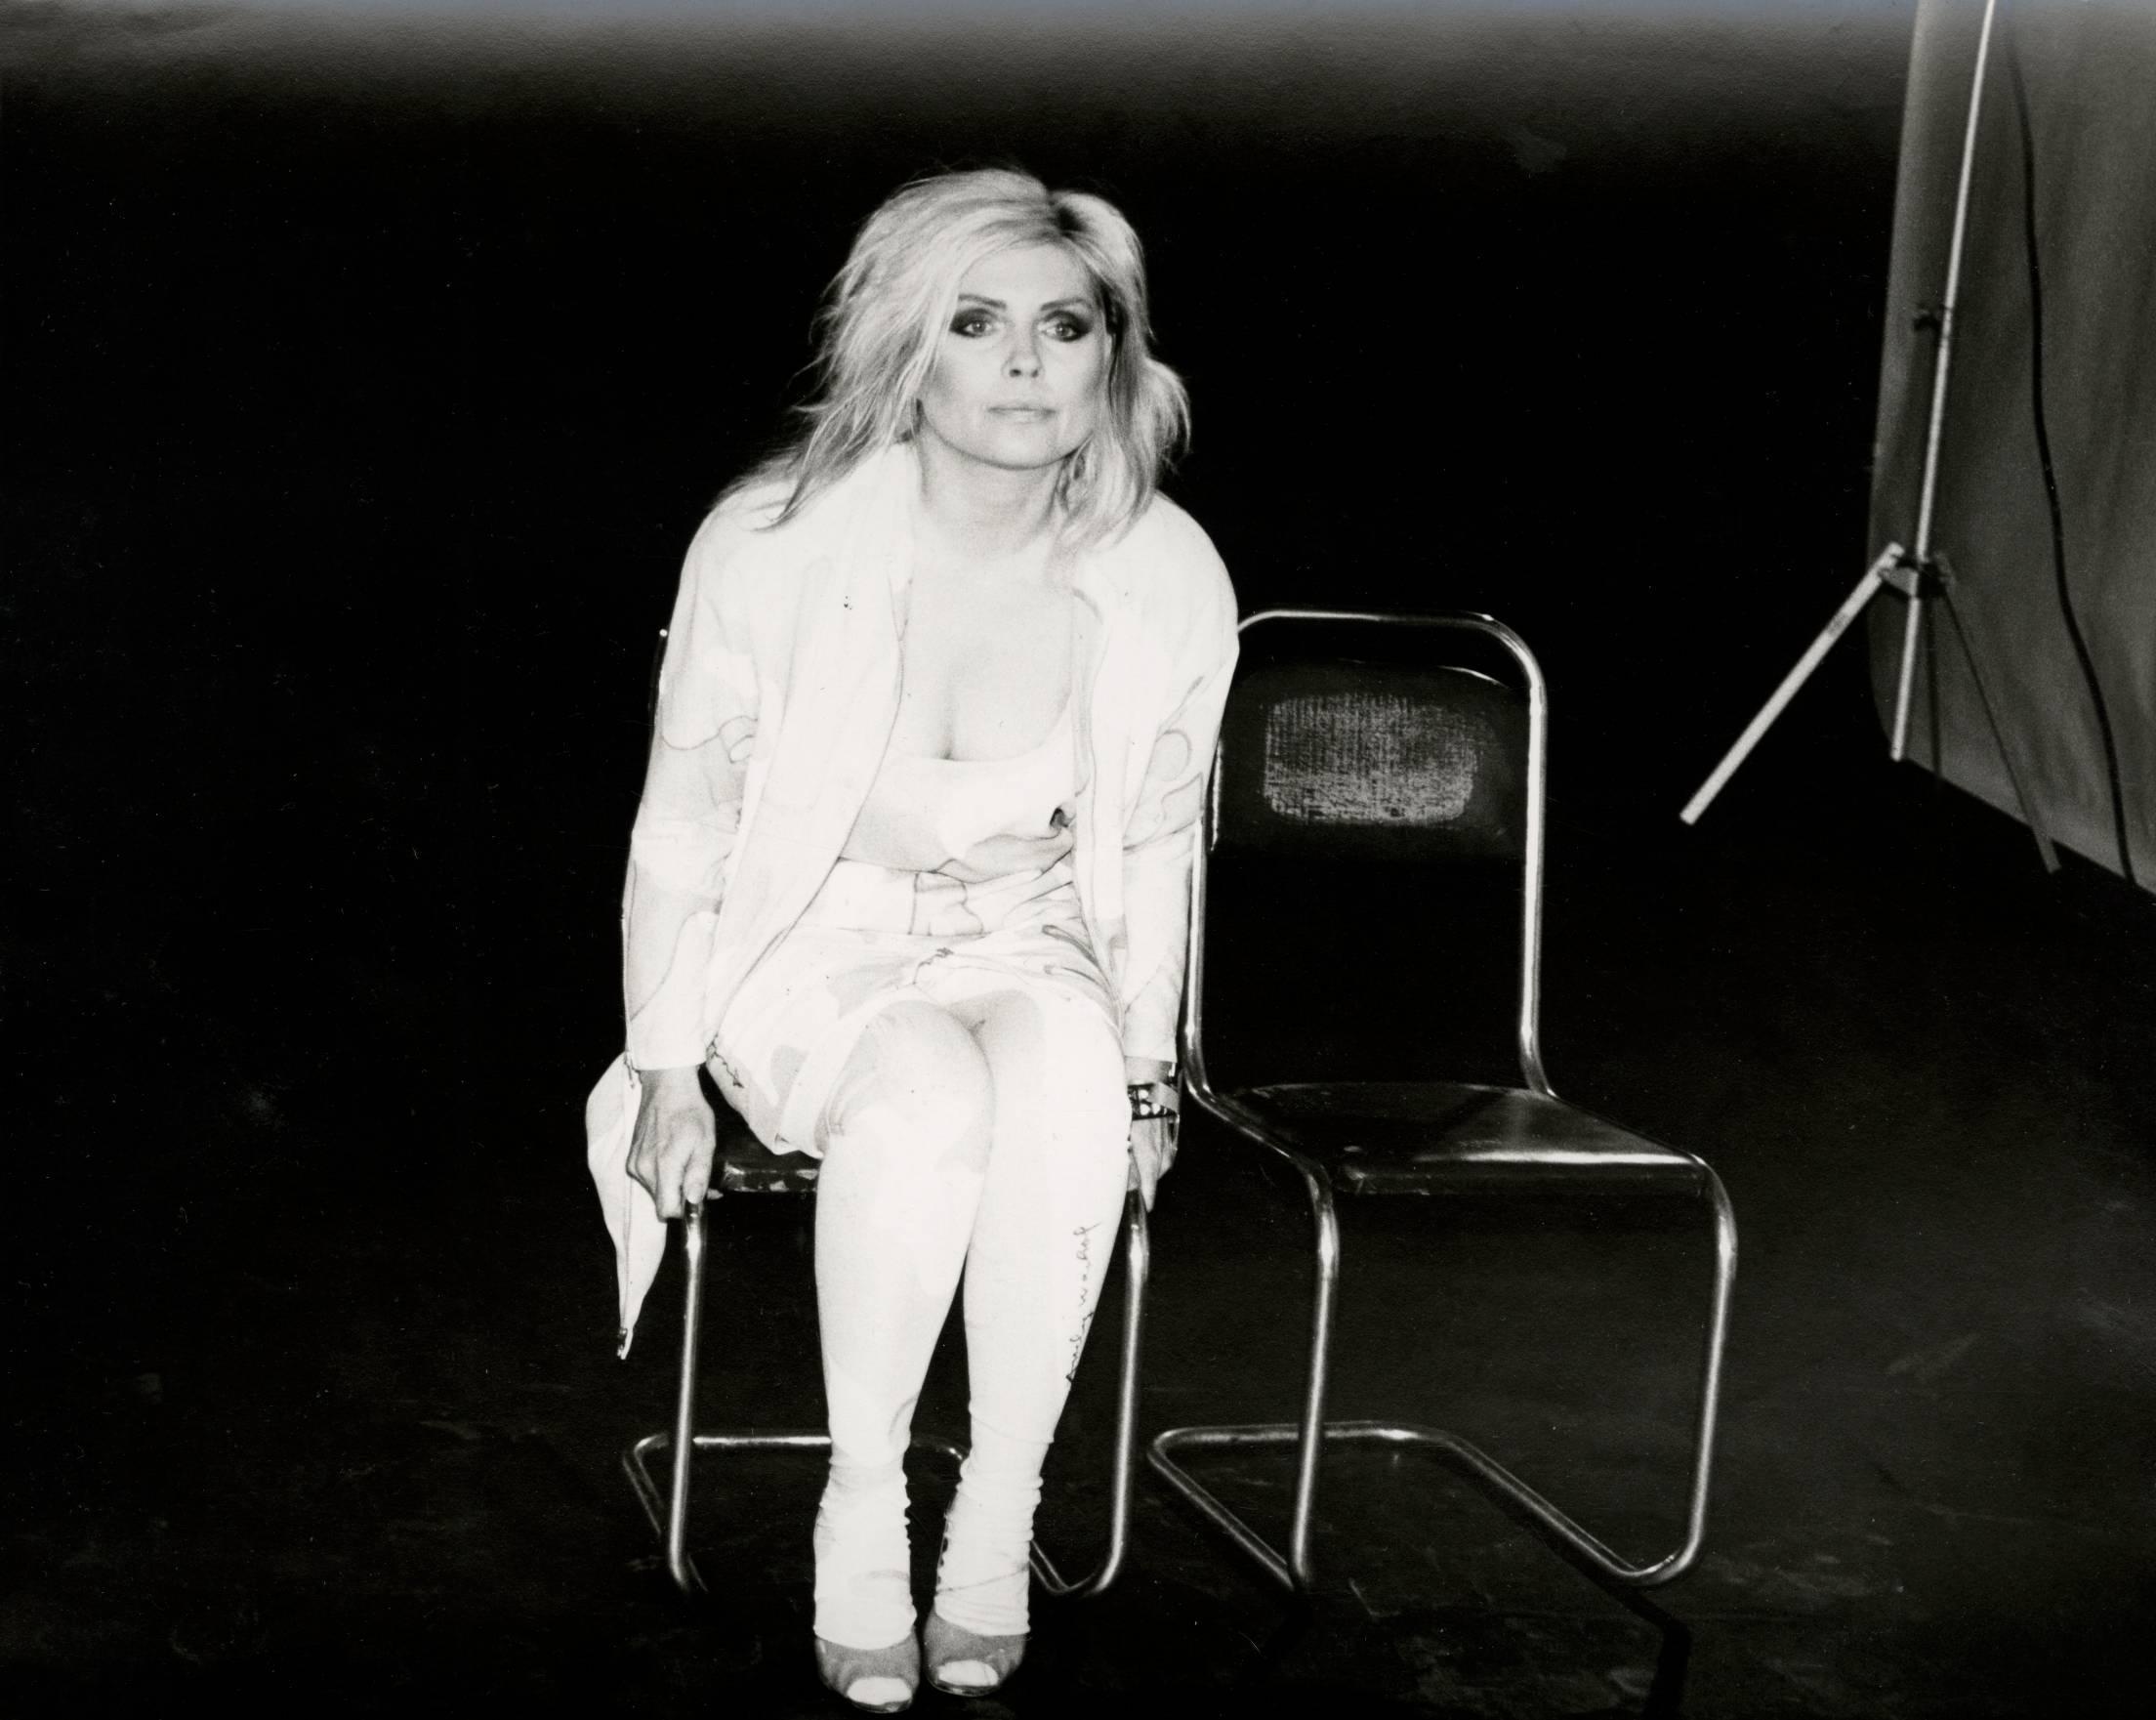 Photograph of Debbie Harry (Blondie), 1985